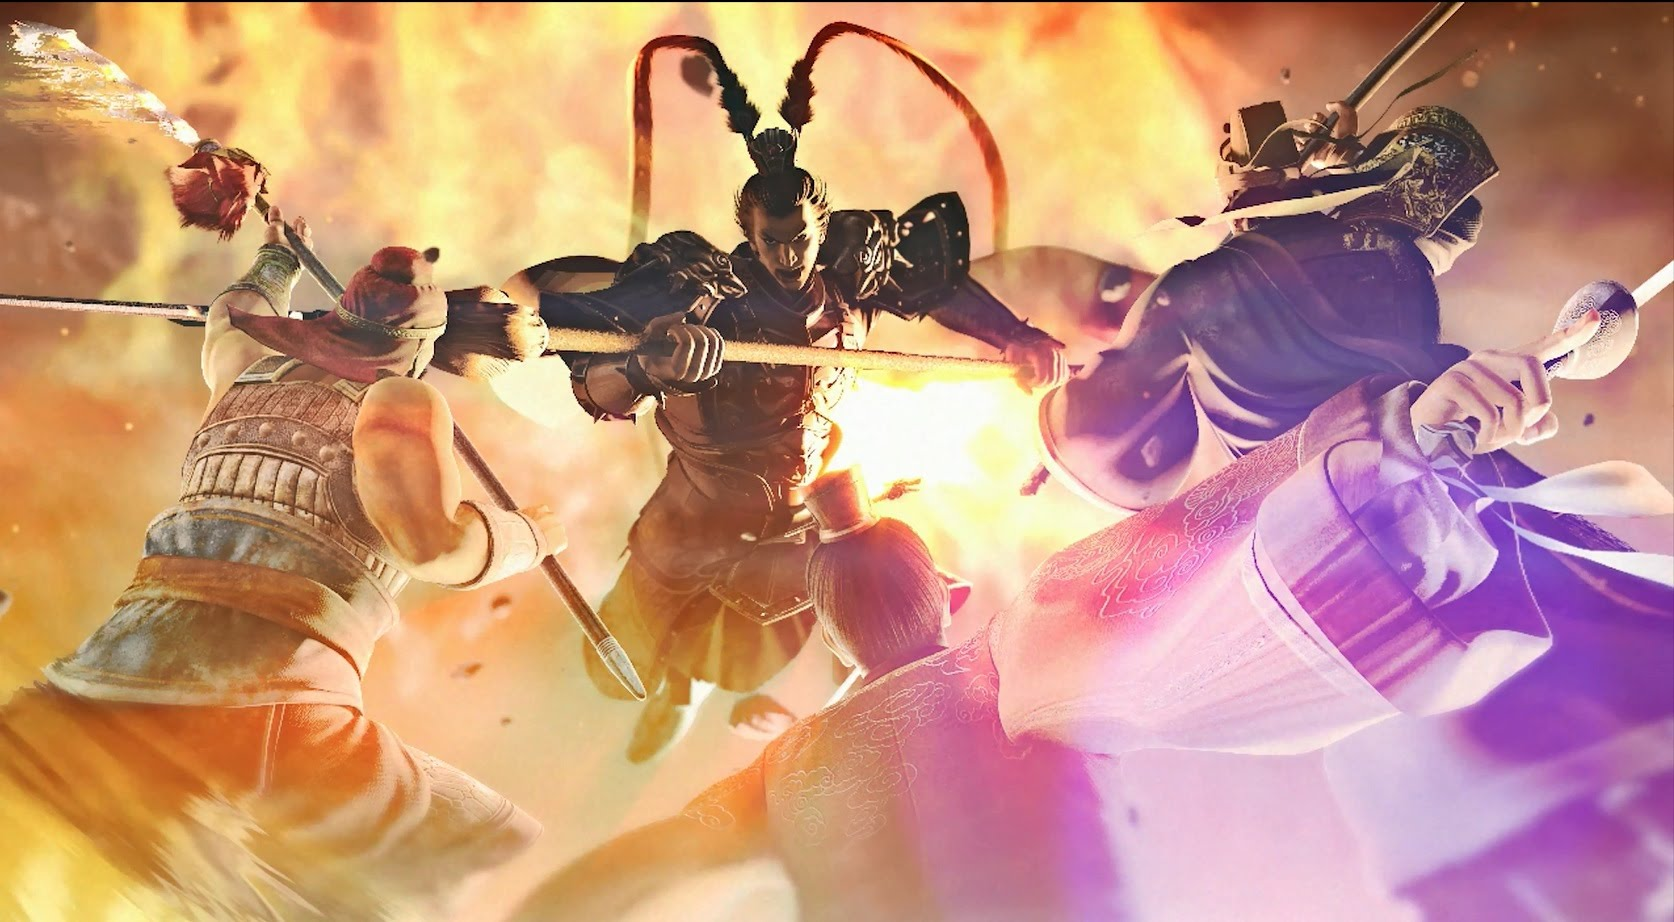 Jual Ps4 Romance Of The Three Kingdoms Xiii Reg 2 Eur Eng Game 3 Blanja